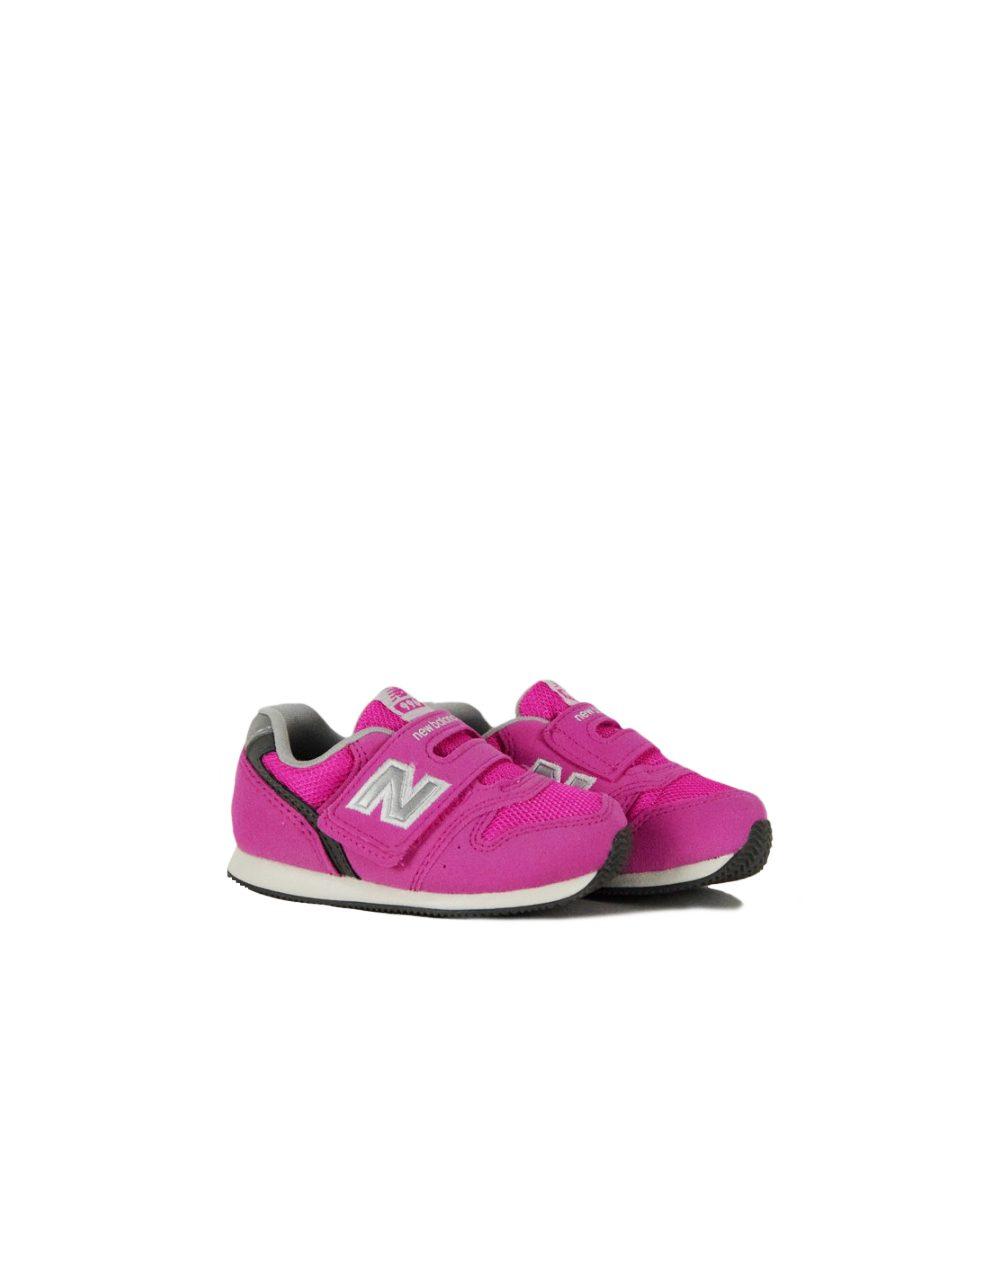 New Balance FS996MAI Pink